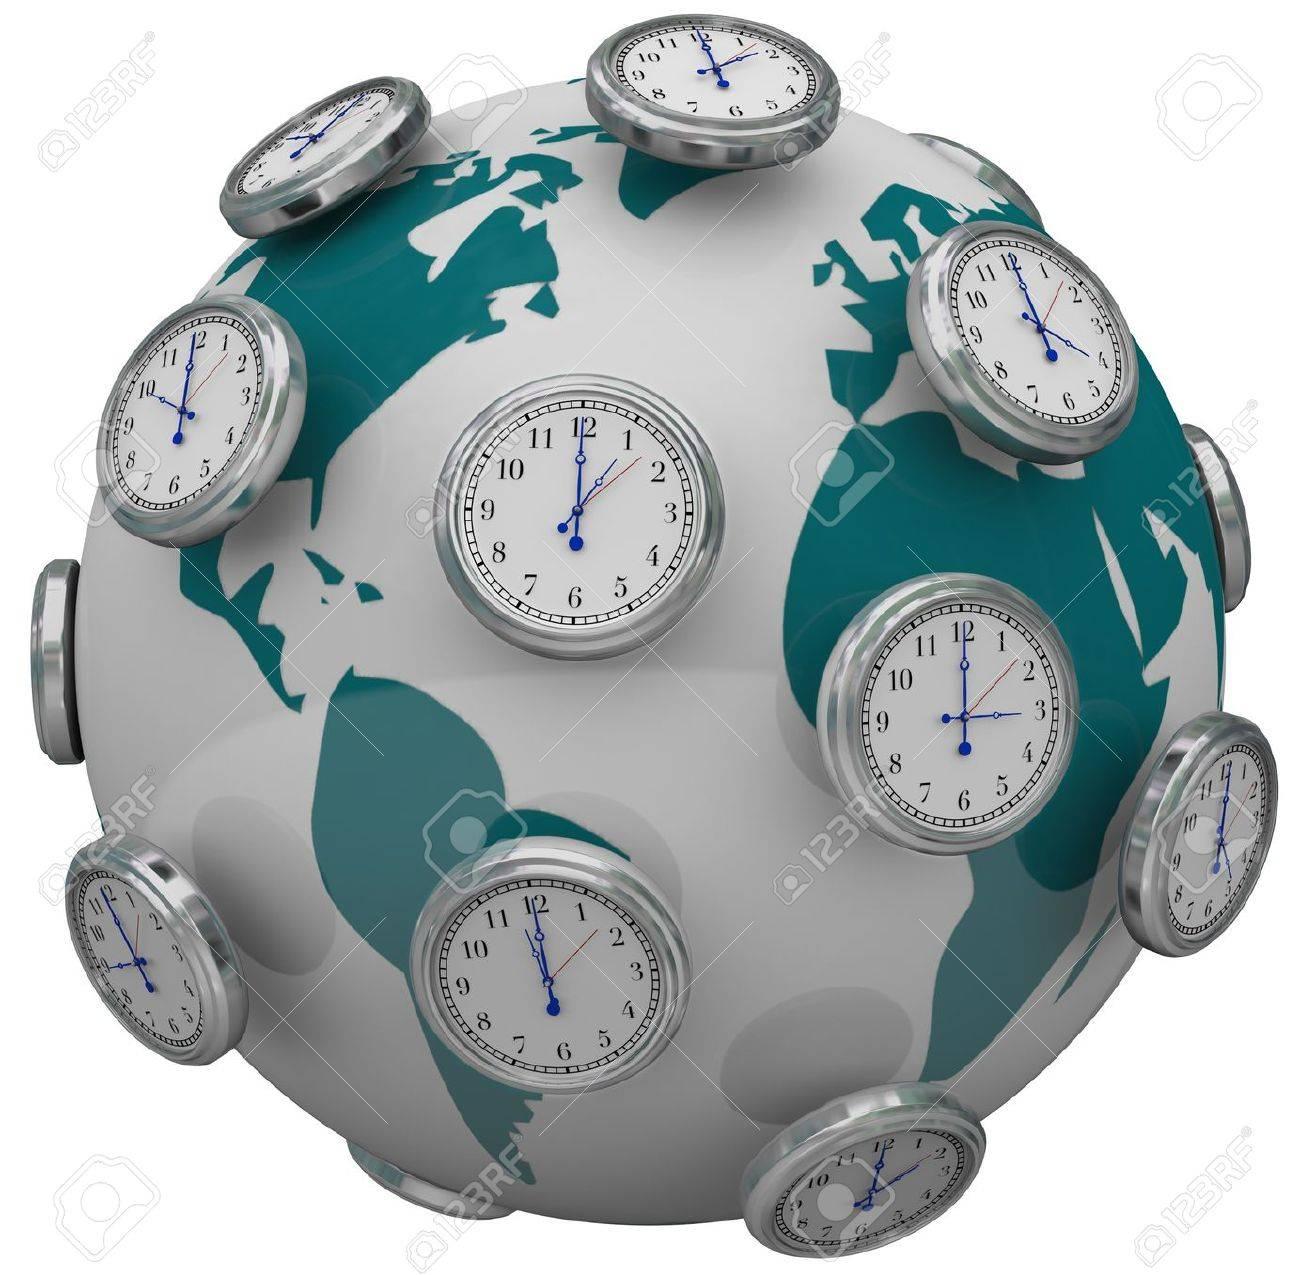 Many Clocks Around The World To Illustrate International Time ...